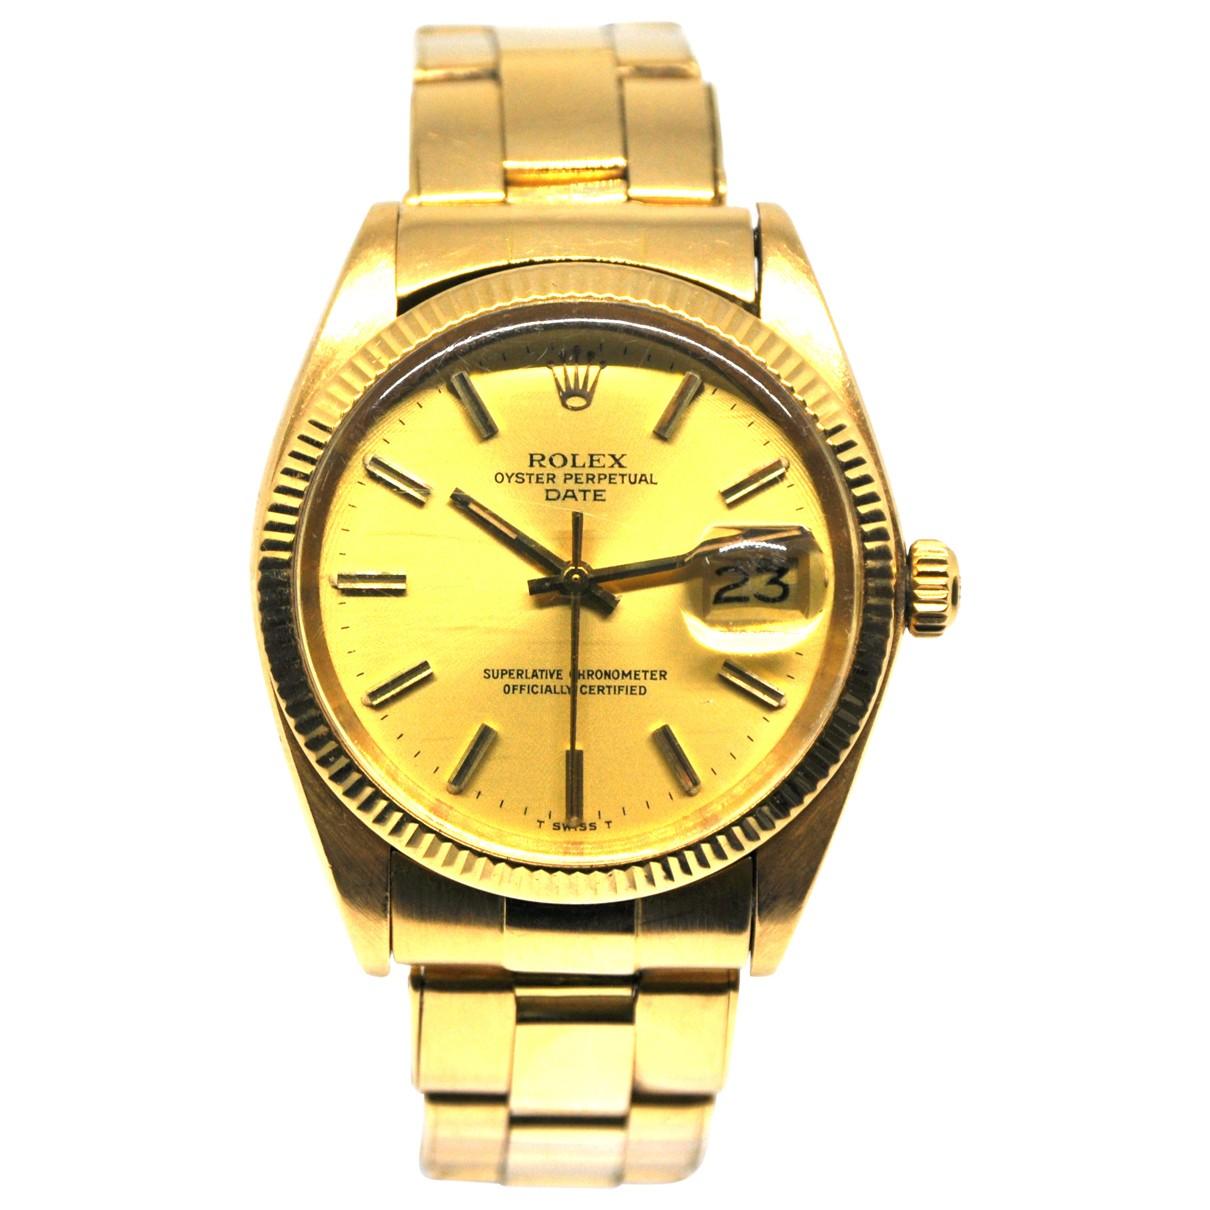 Rolex Oyster Perpetual 34mm Uhr in  Gelb Gelbgold